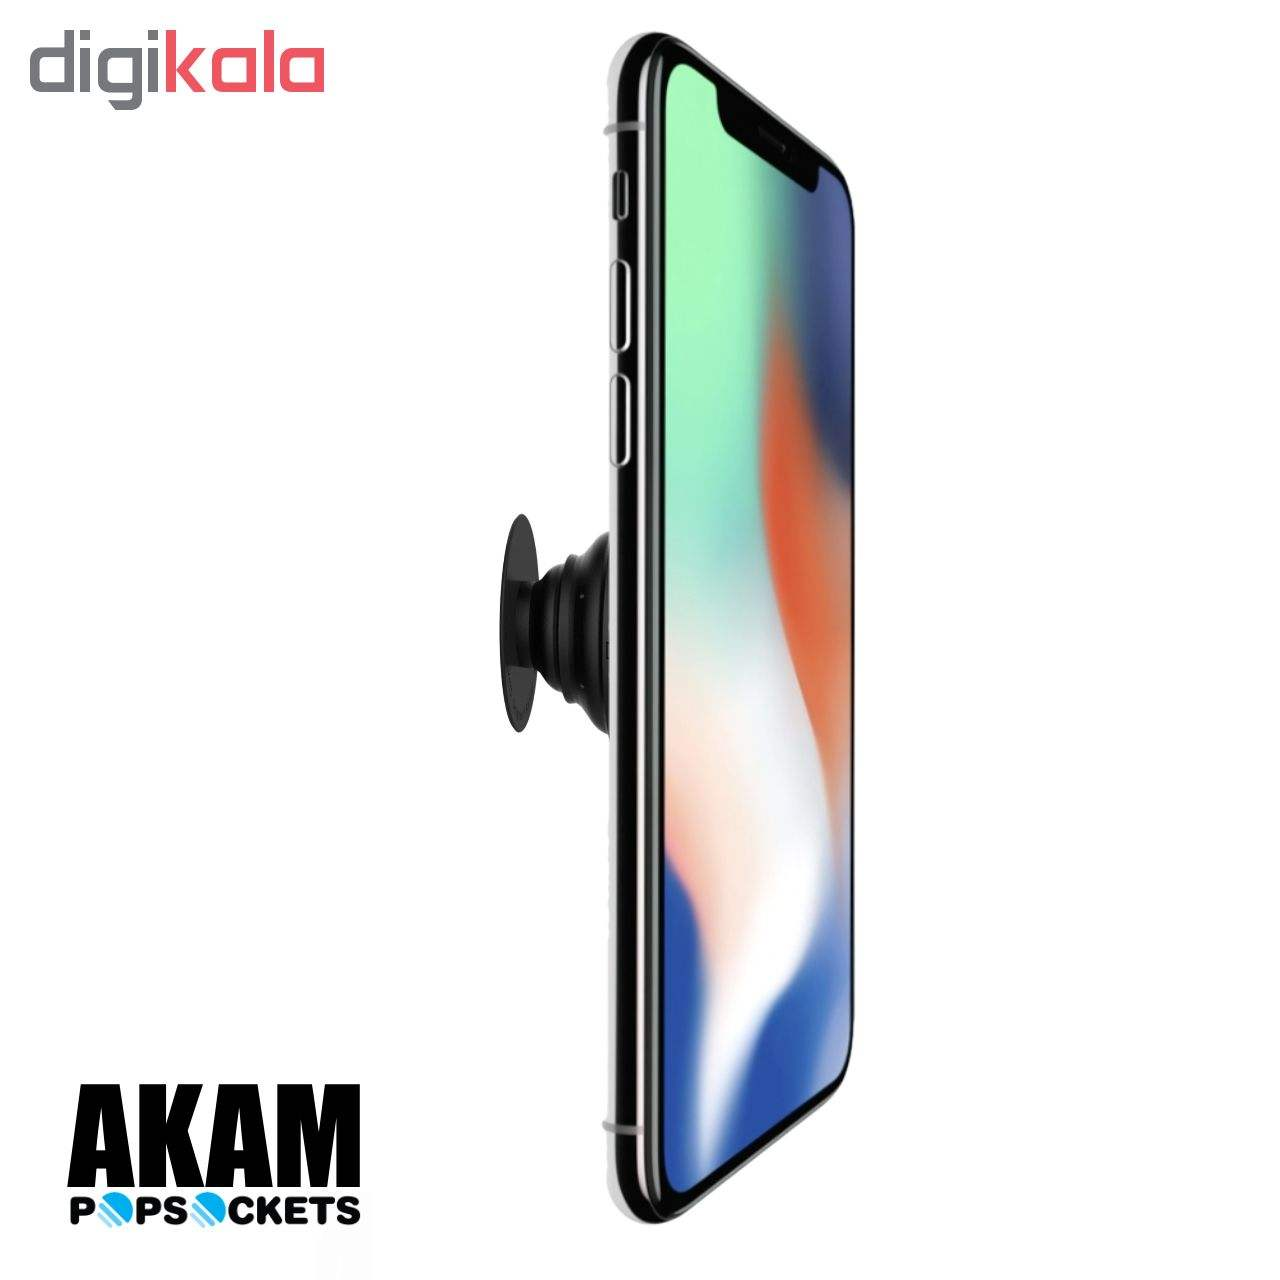 پایه نگهدارنده گوشی موبایل پاپ سوکت آکام مدل APS0079 main 1 10